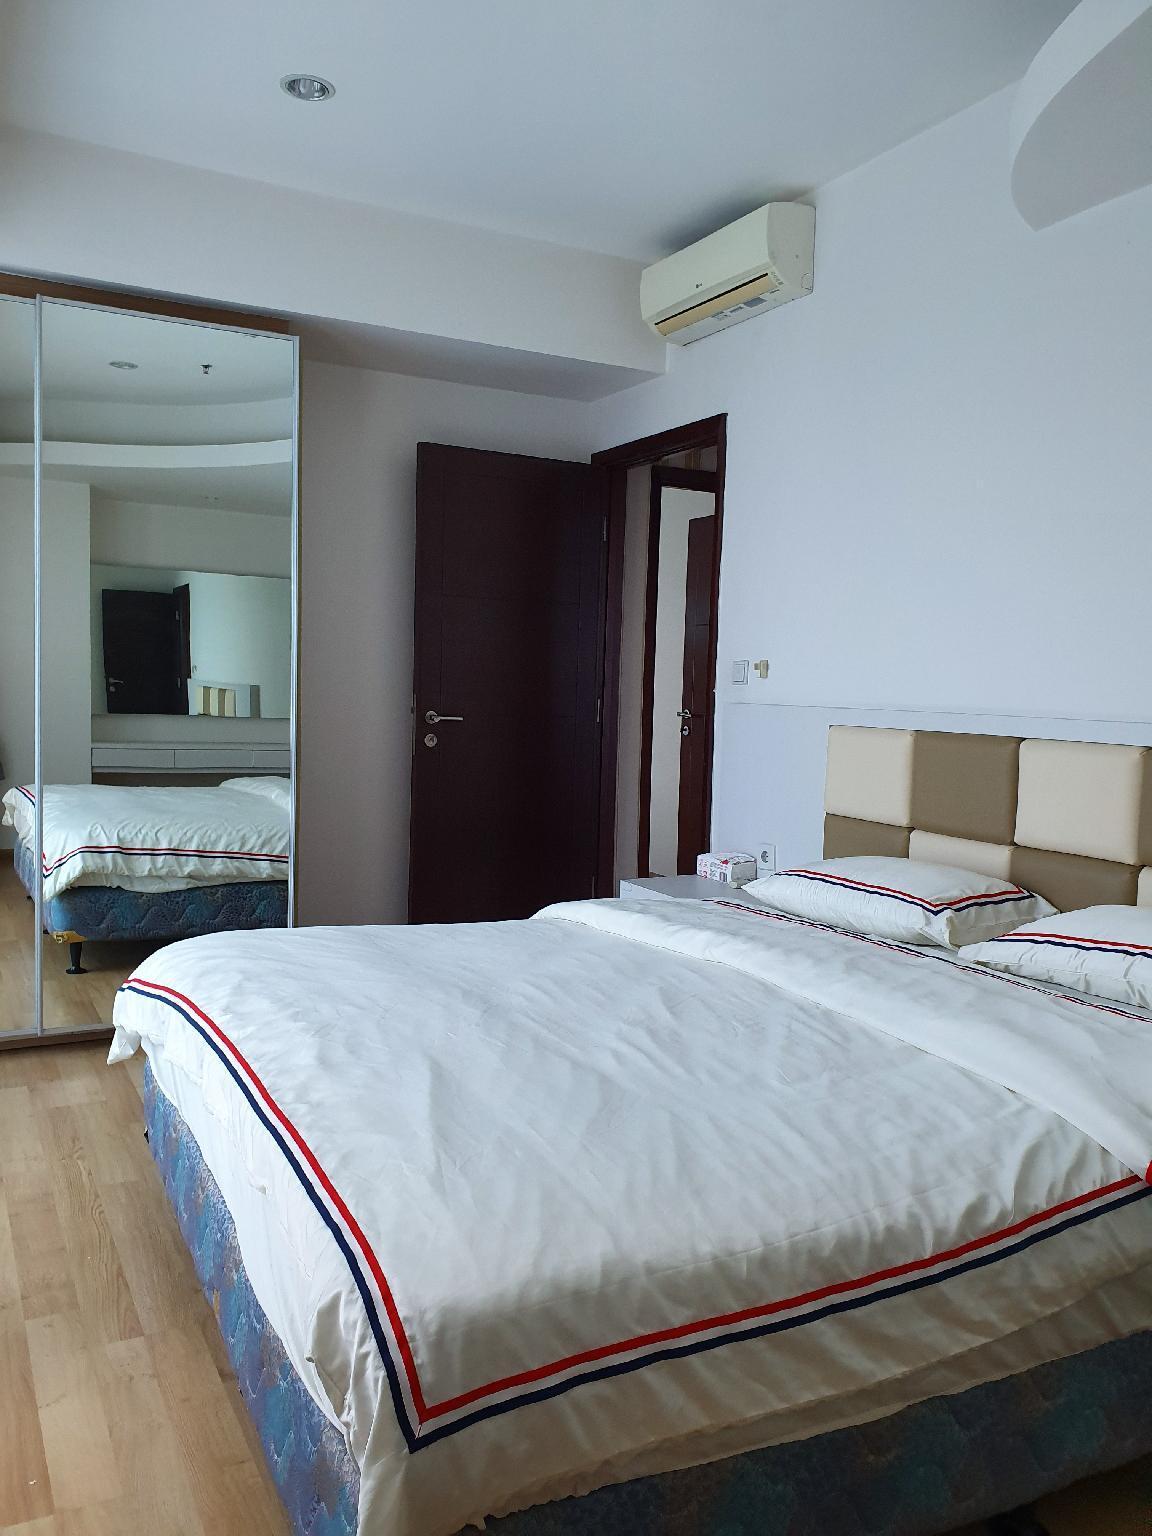 165m/sq, 6 beds, 3 baths at Casa Grande Residence, South Jakarta